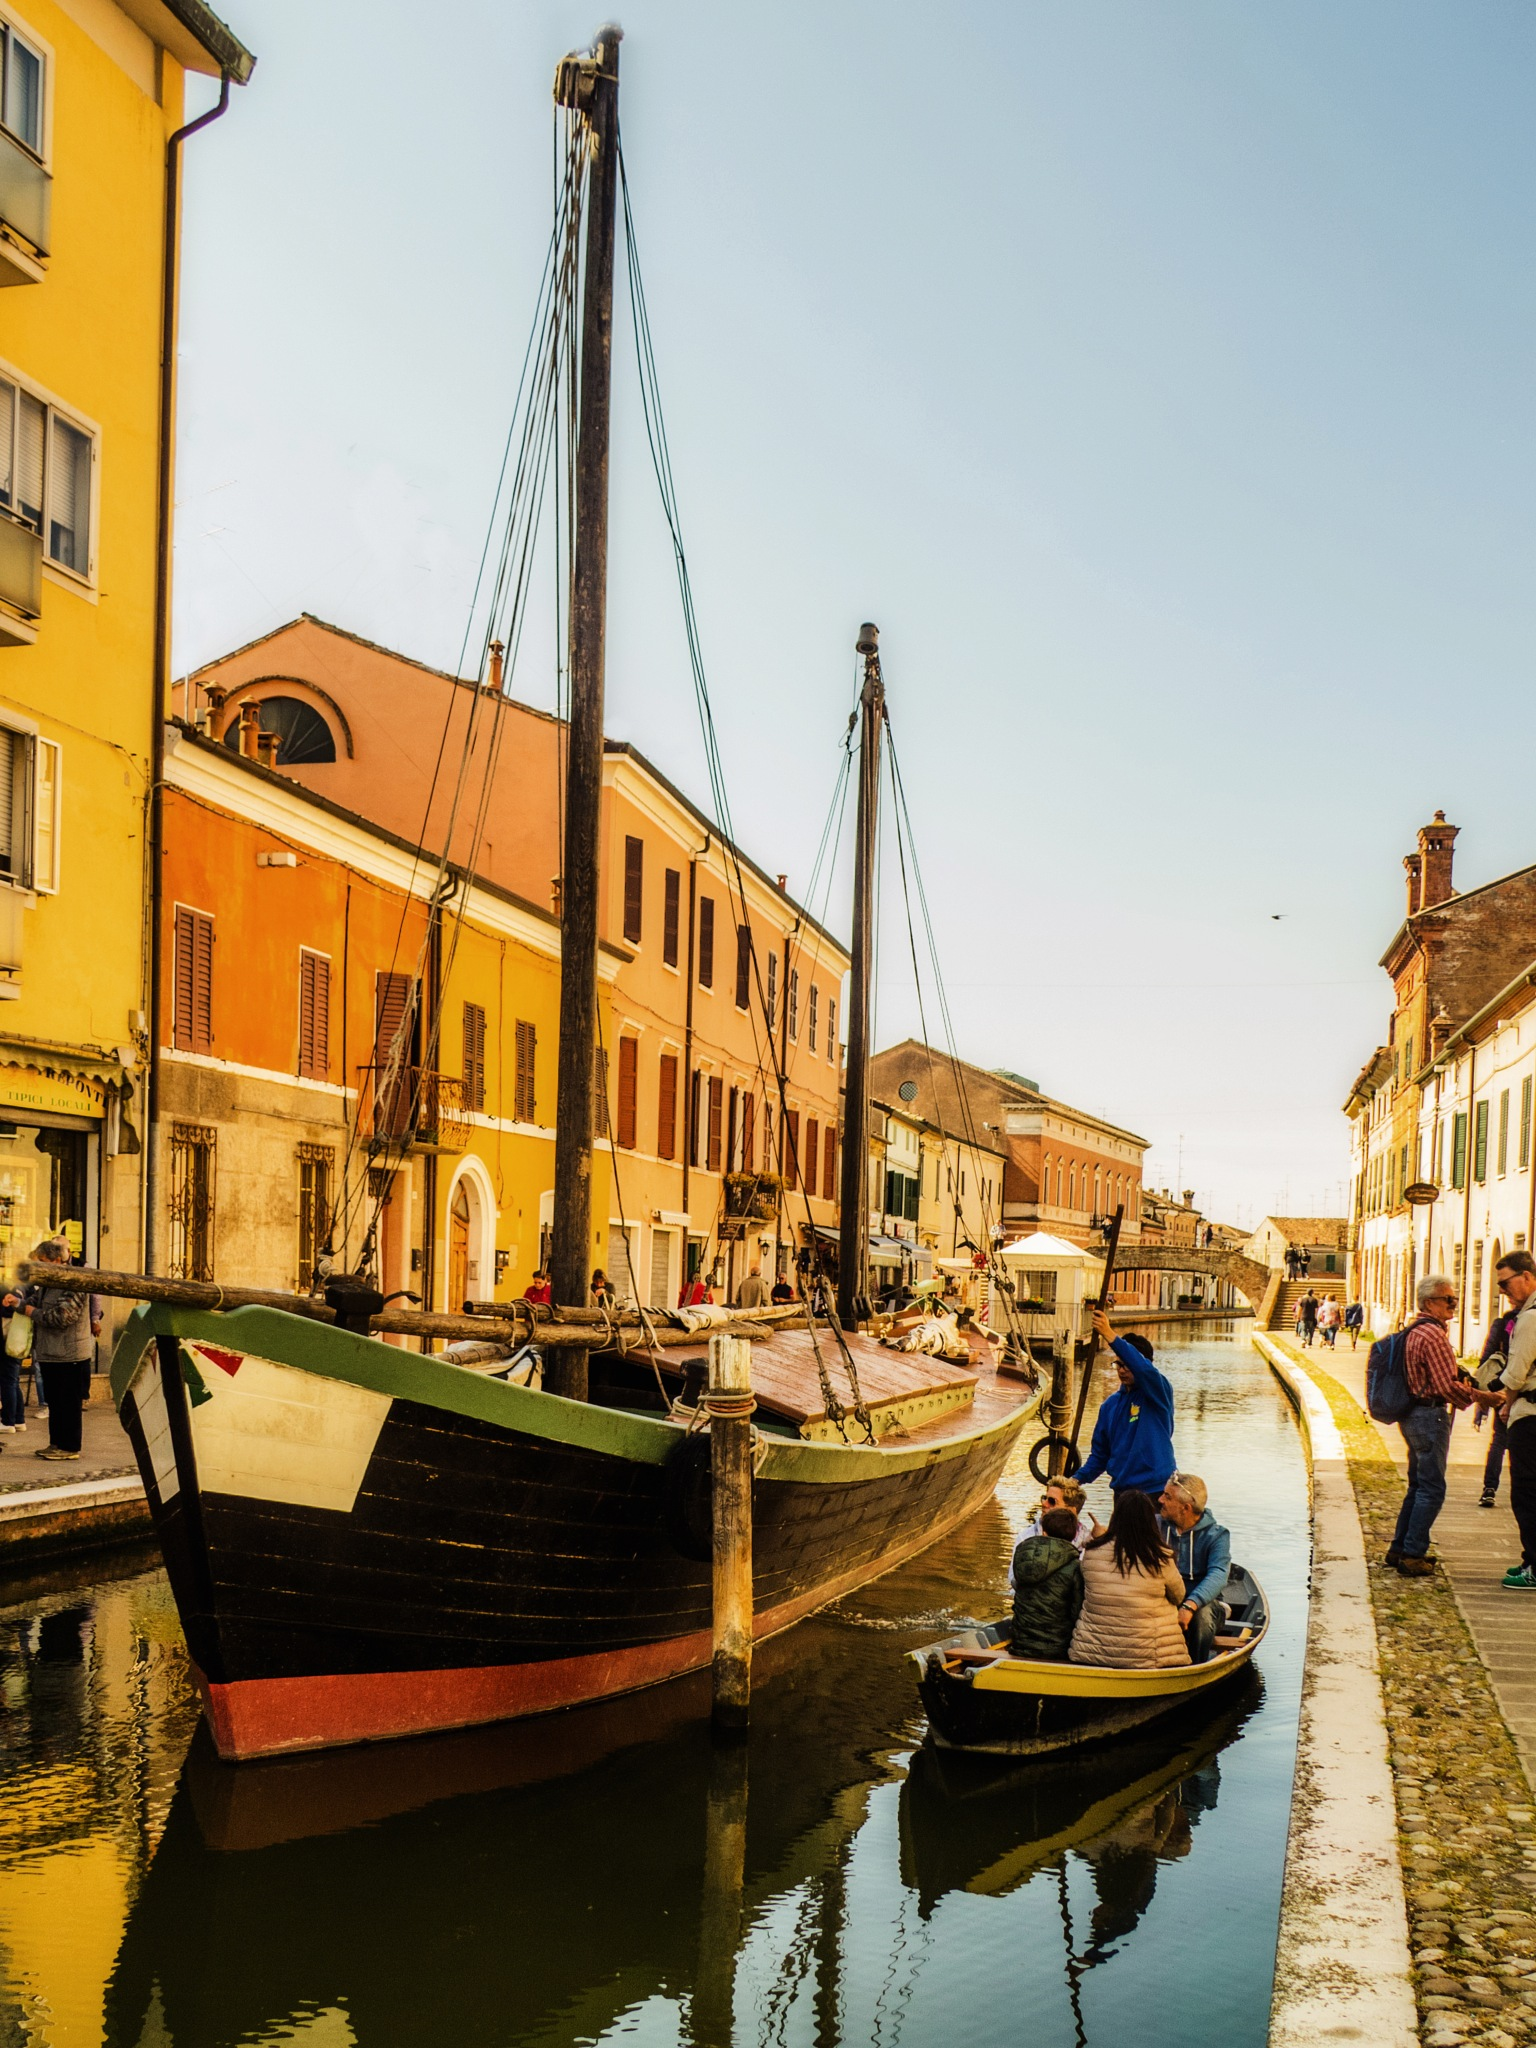 Comacchio tourist tour by sunrisesunset